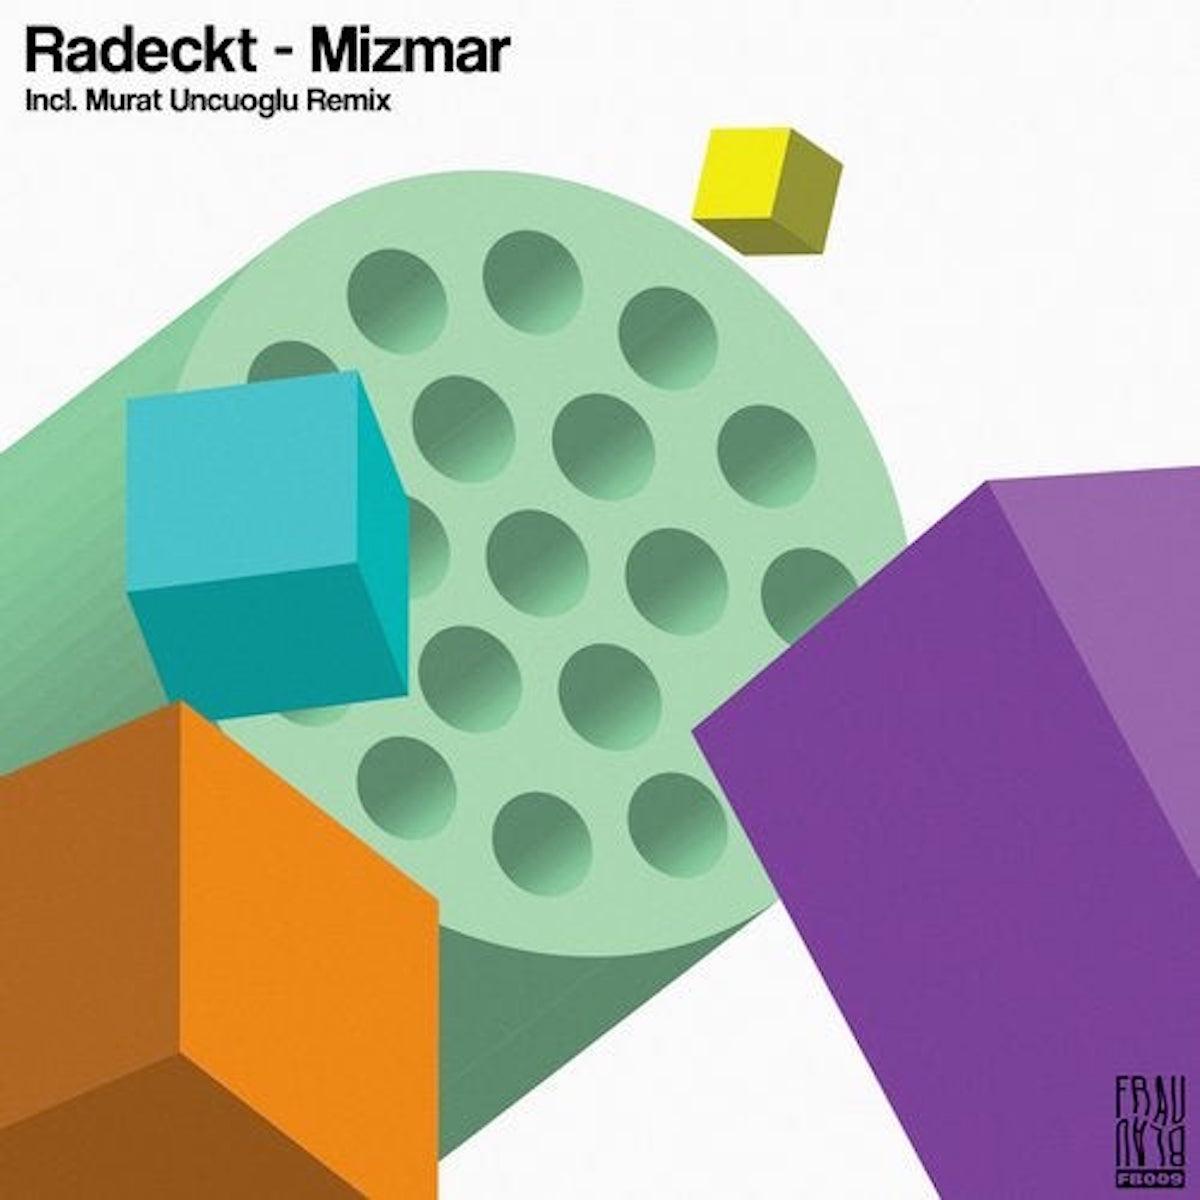 Radeckt Mizmar EP is out on Frau Blau